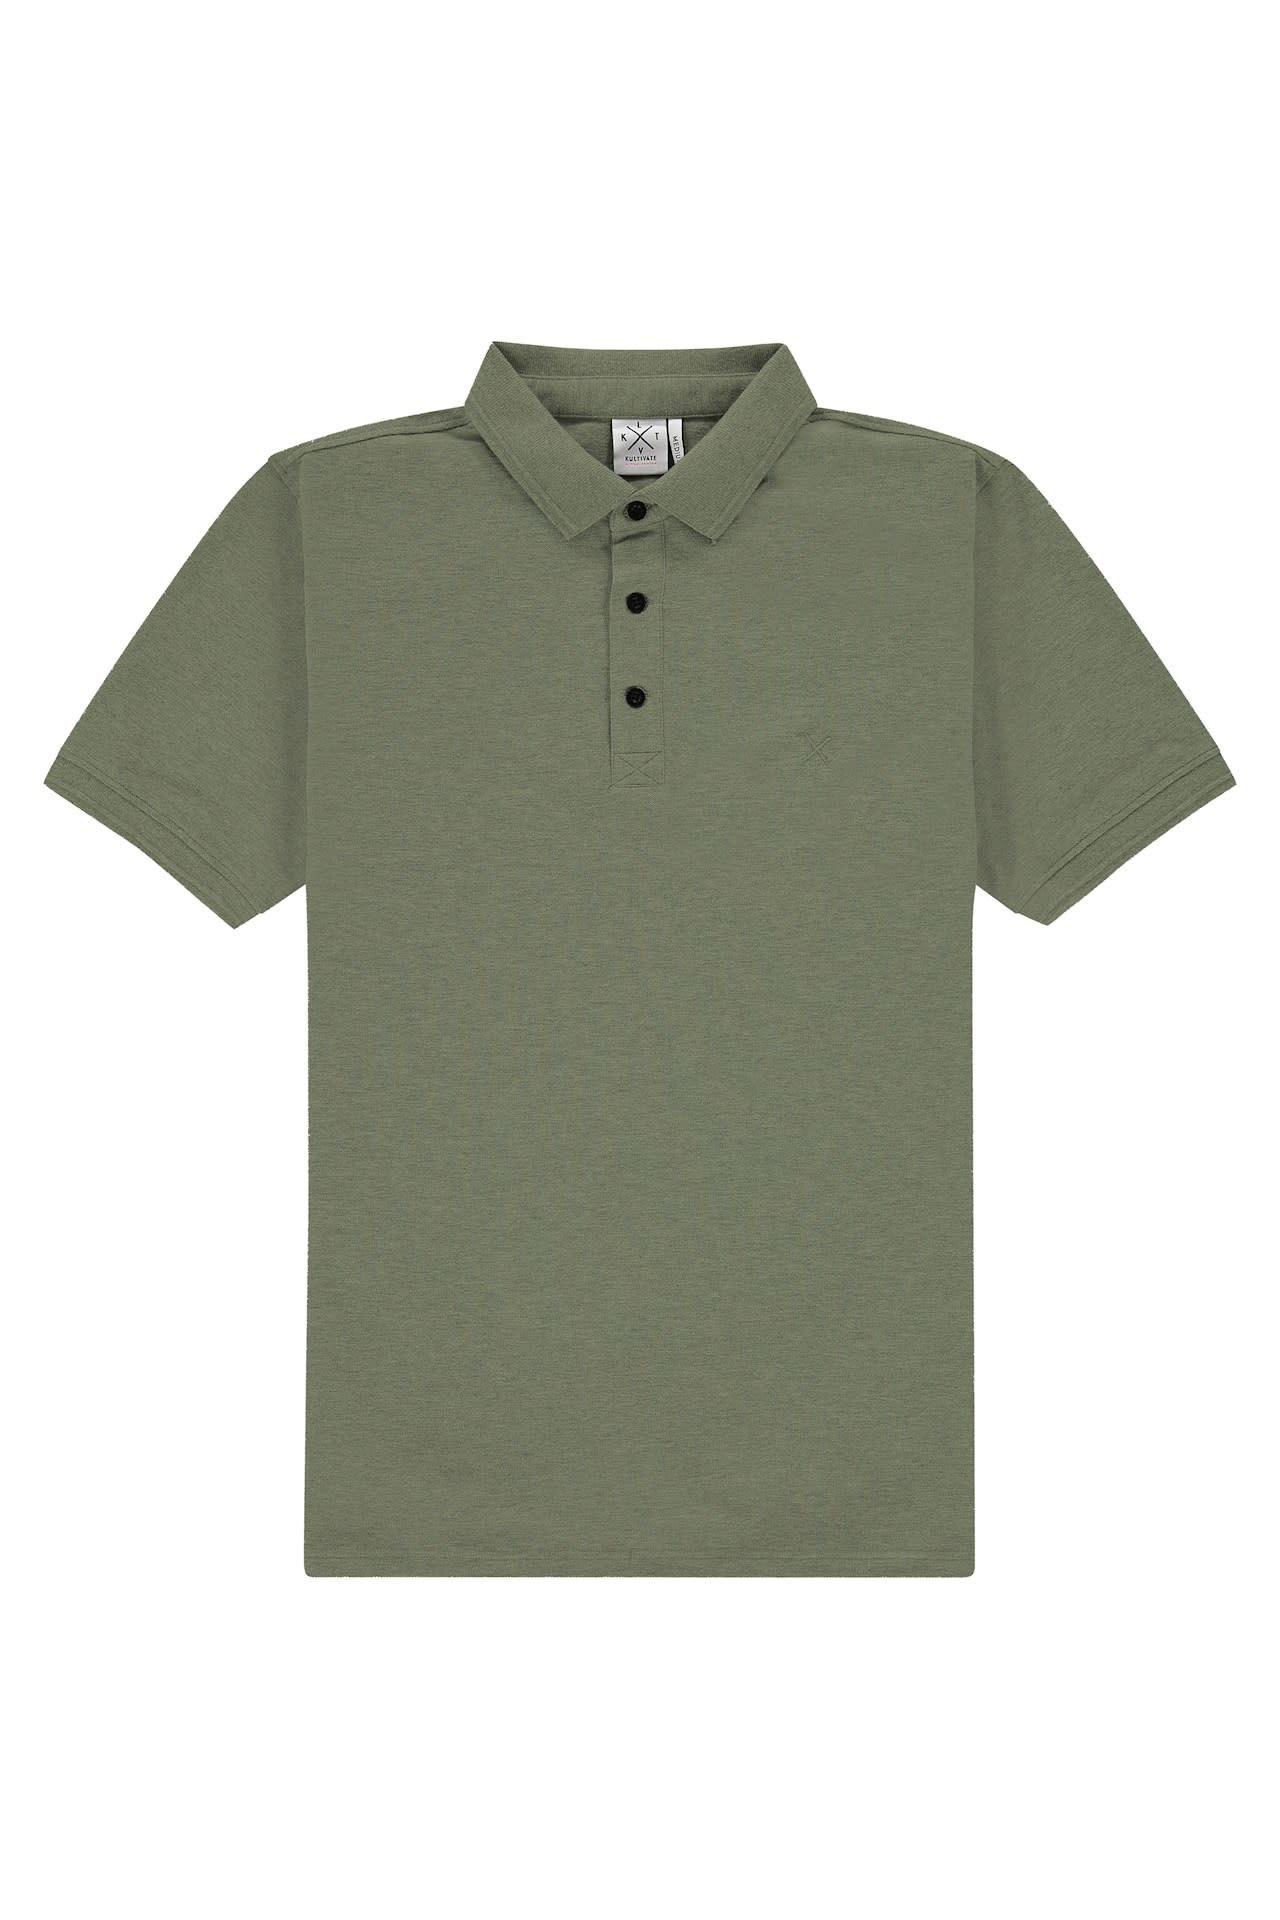 Kultivate Kultivate Keene Polo Army Green